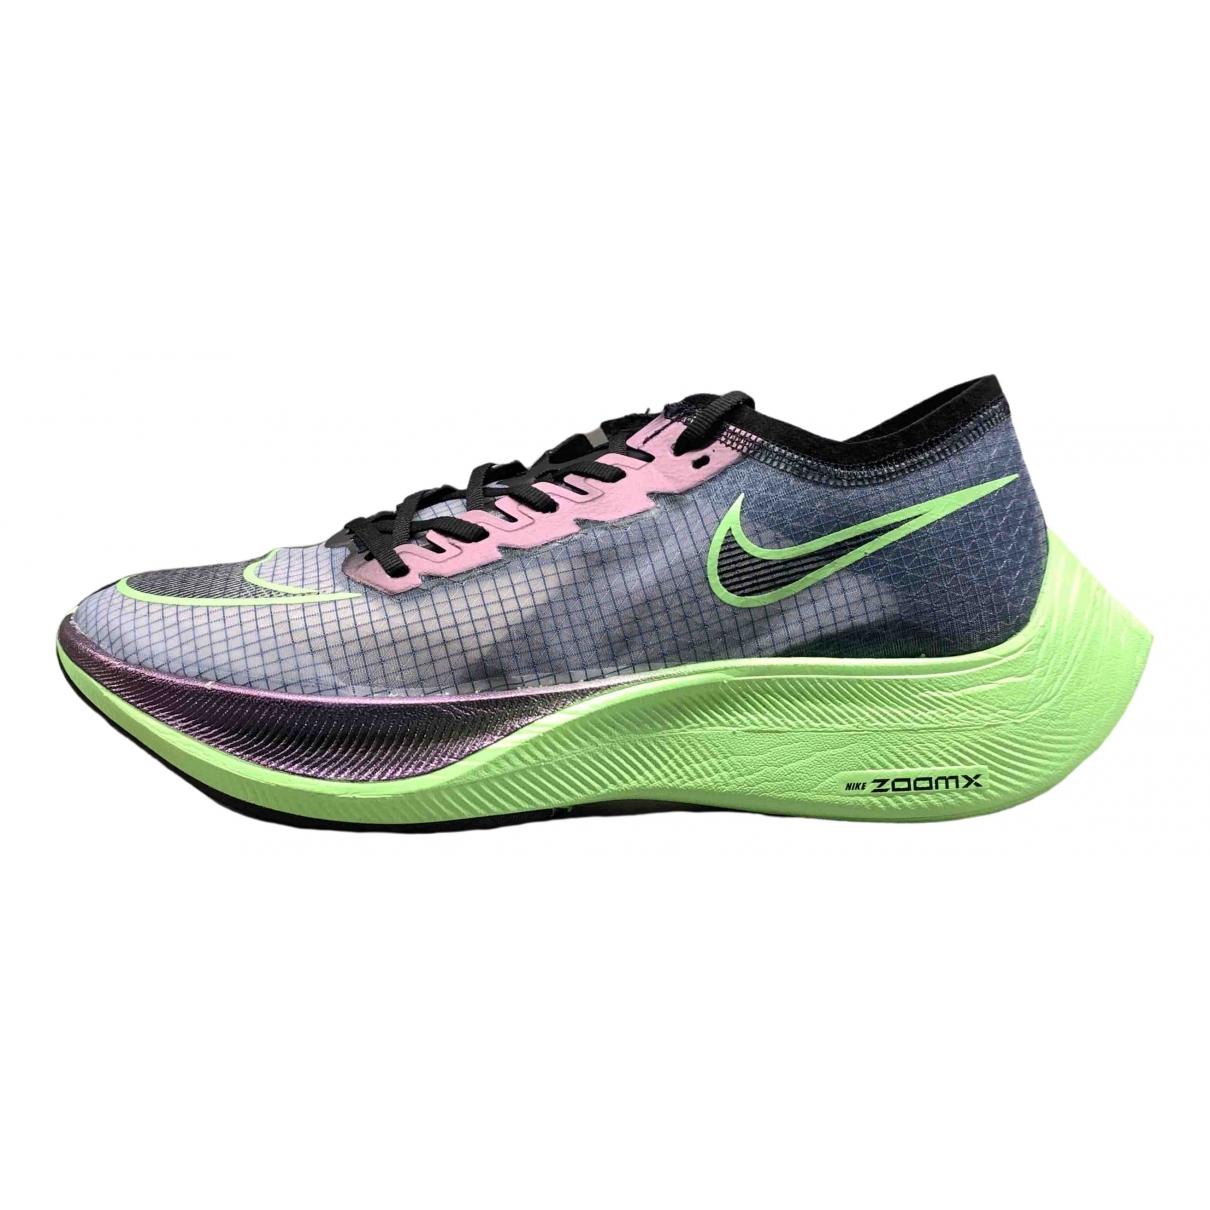 Nike \N Multicolour Trainers for Men 42 EU